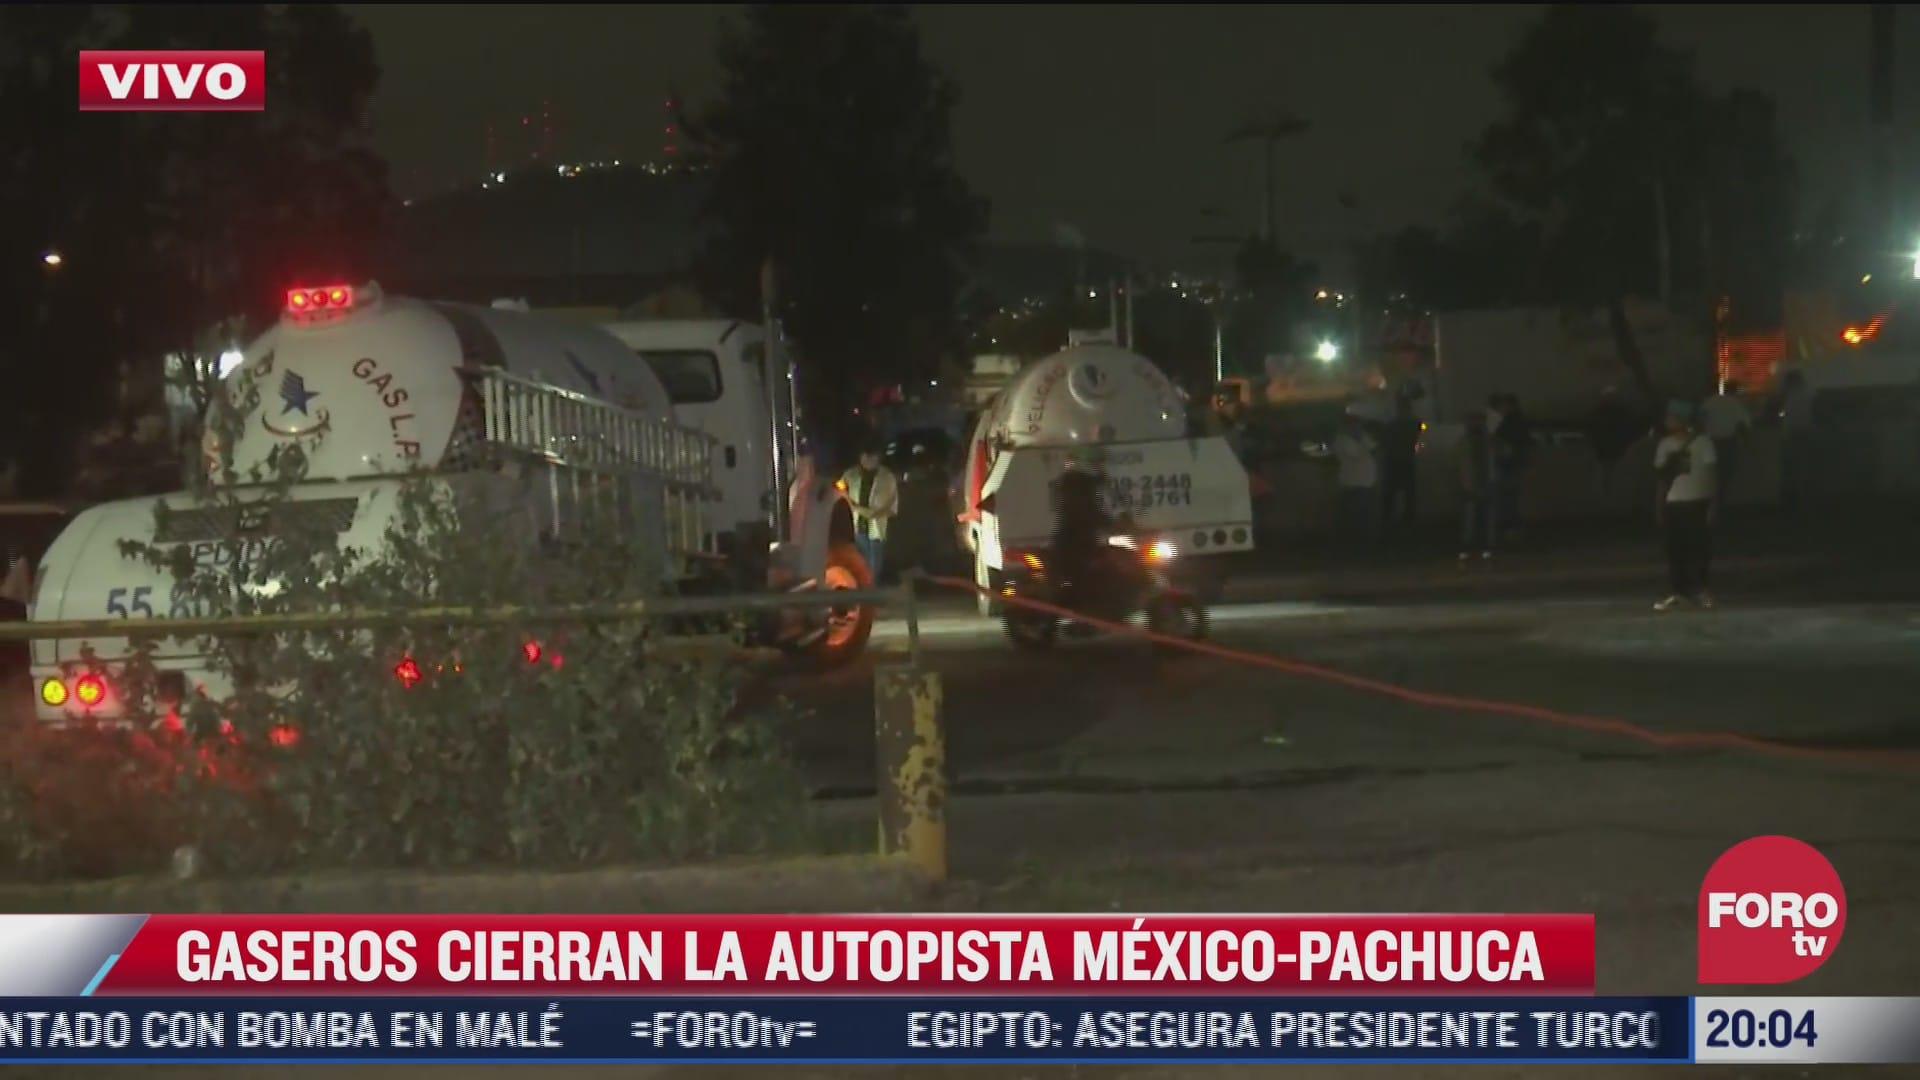 intercambian insultos usuarios de transporte publico con gaseros en autopista mexico pachuca